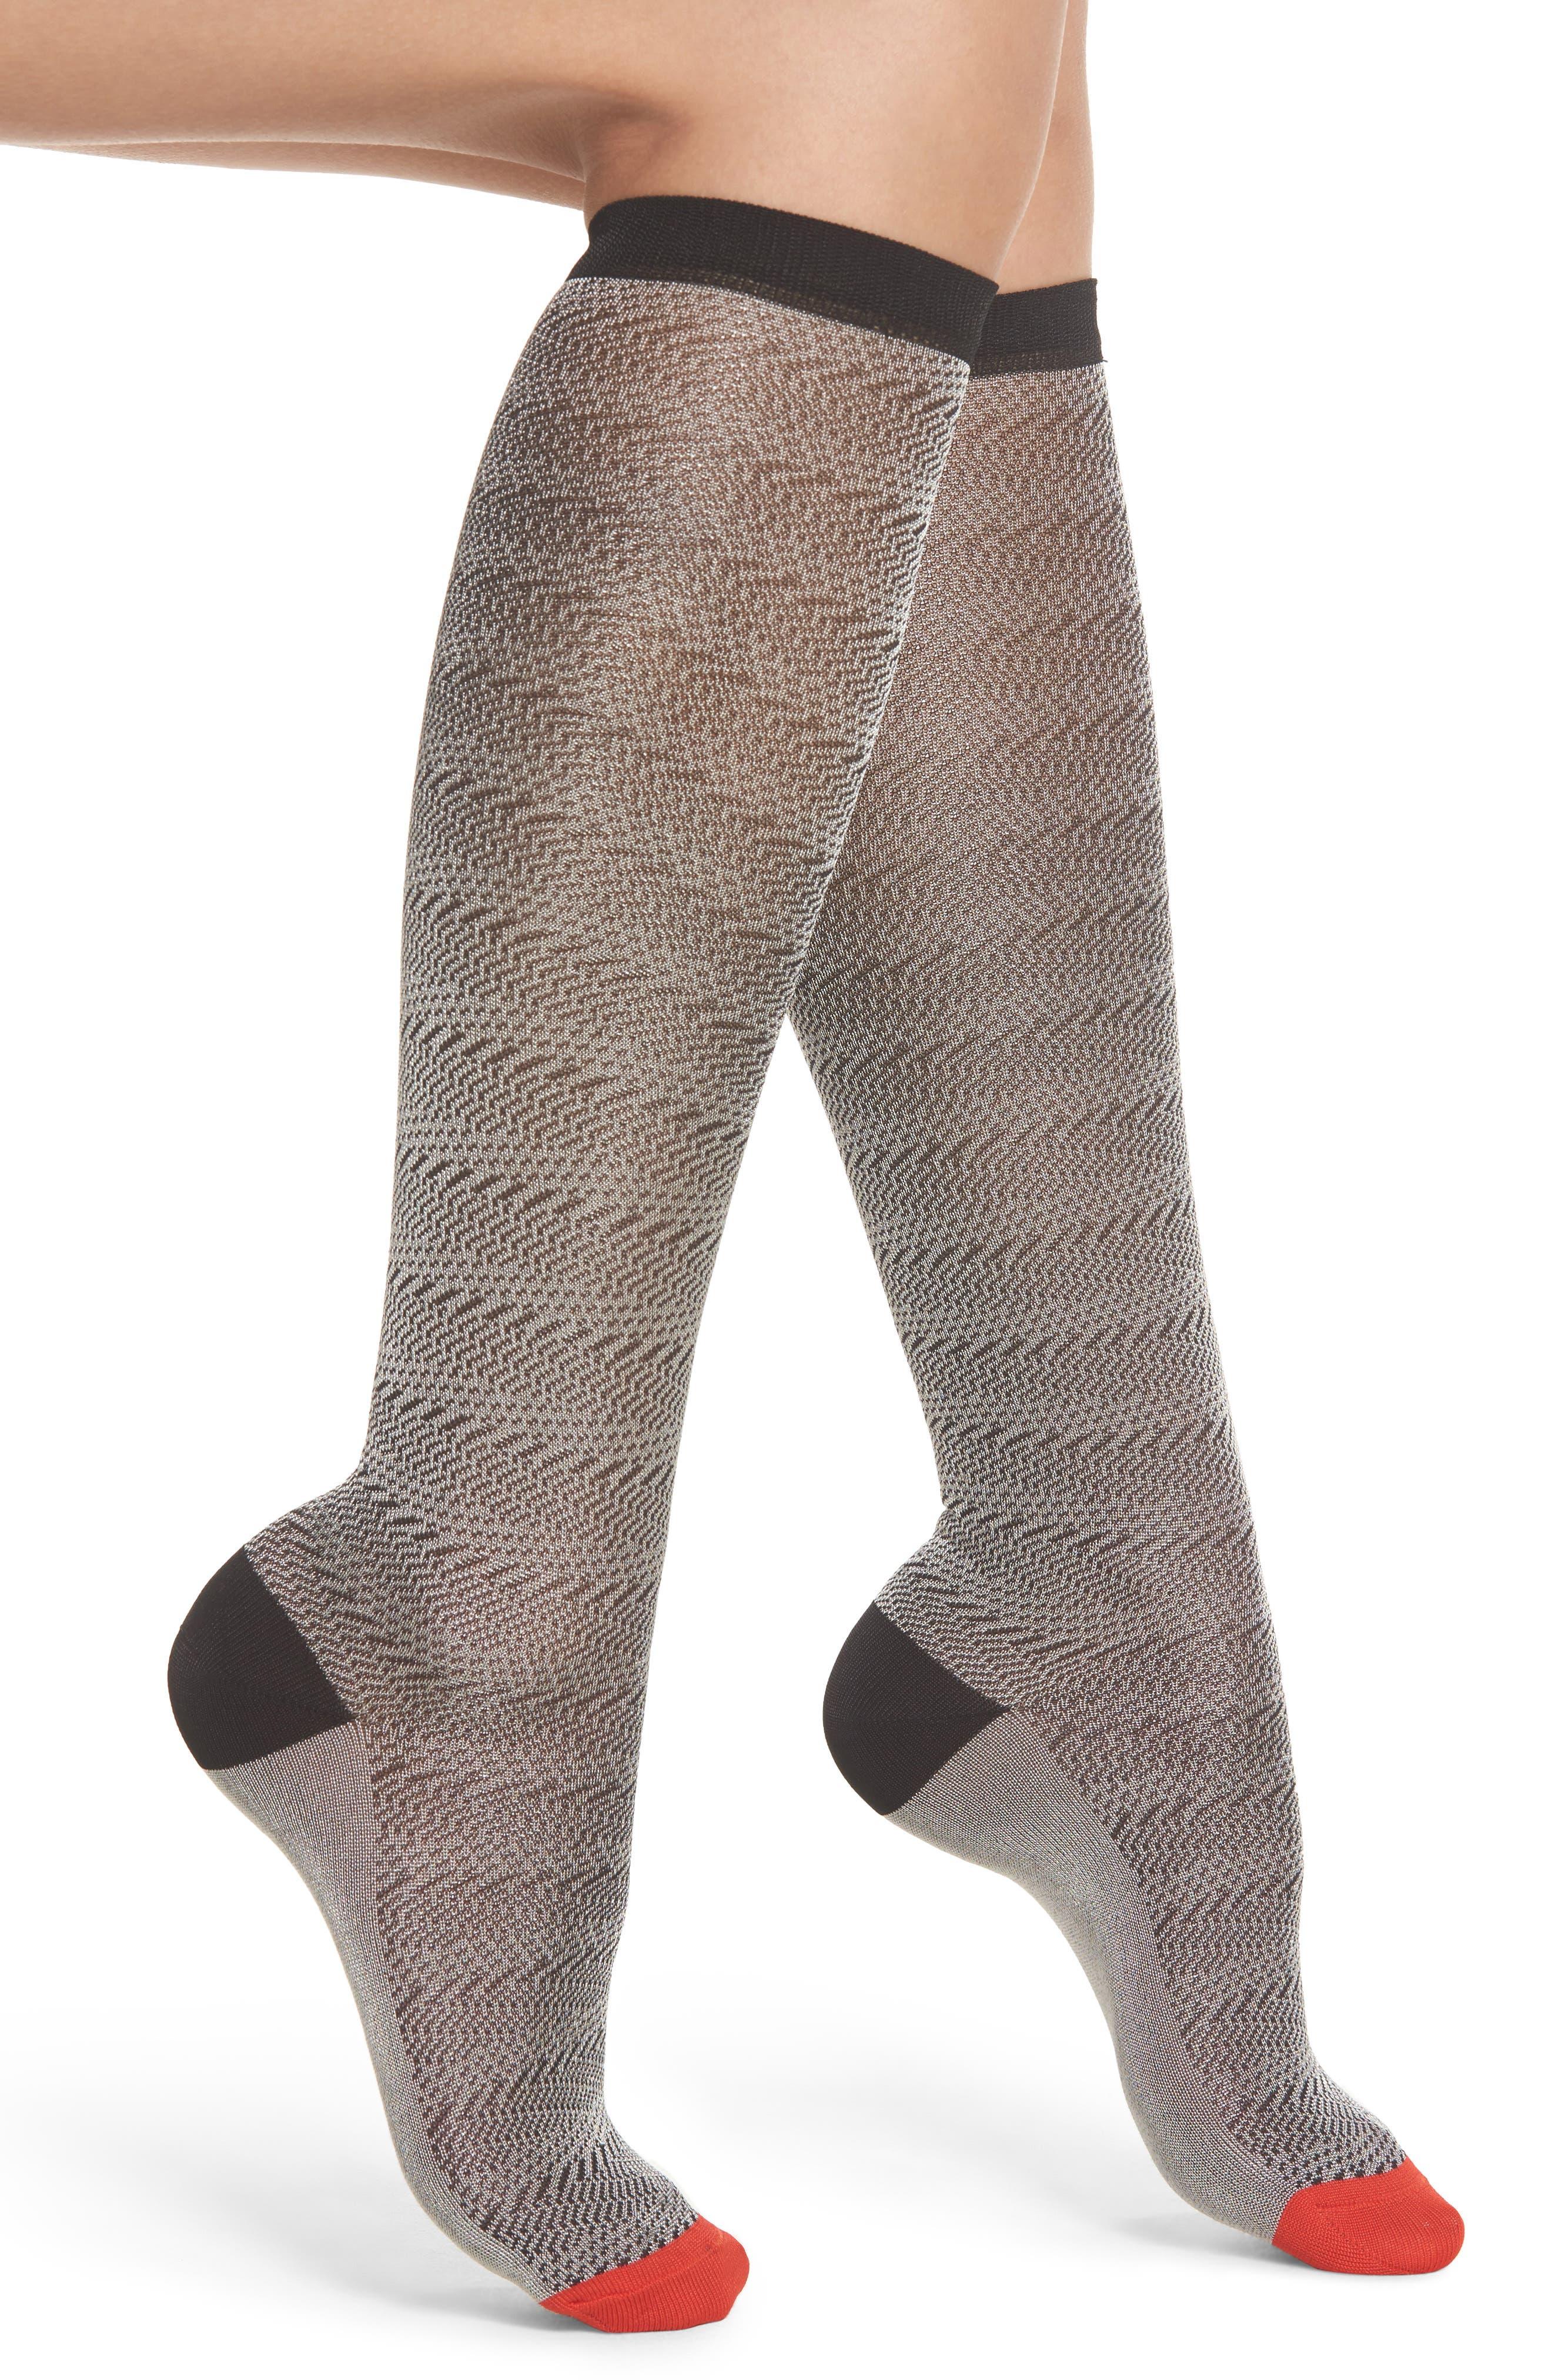 Jane Knee High Socks,                         Main,                         color, Black